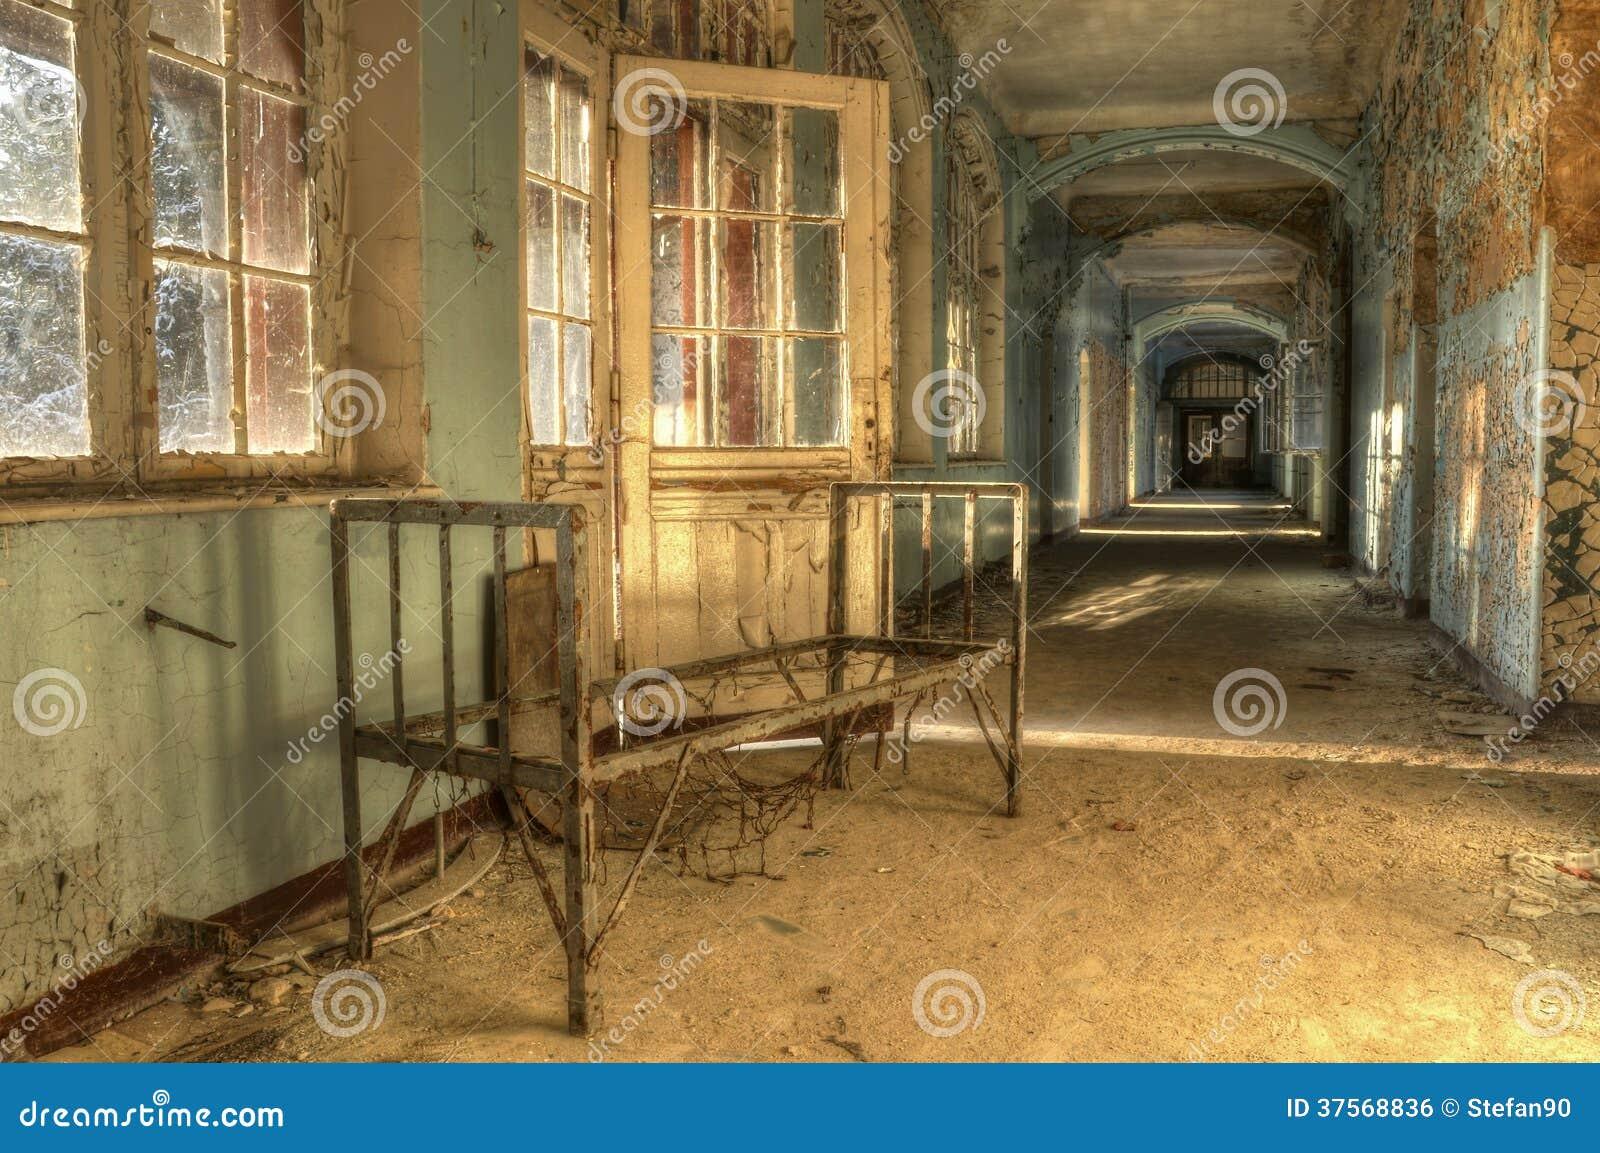 altes bett in einem verlassenen krankenhaus lizenzfreies stockbild bild 37568836. Black Bedroom Furniture Sets. Home Design Ideas